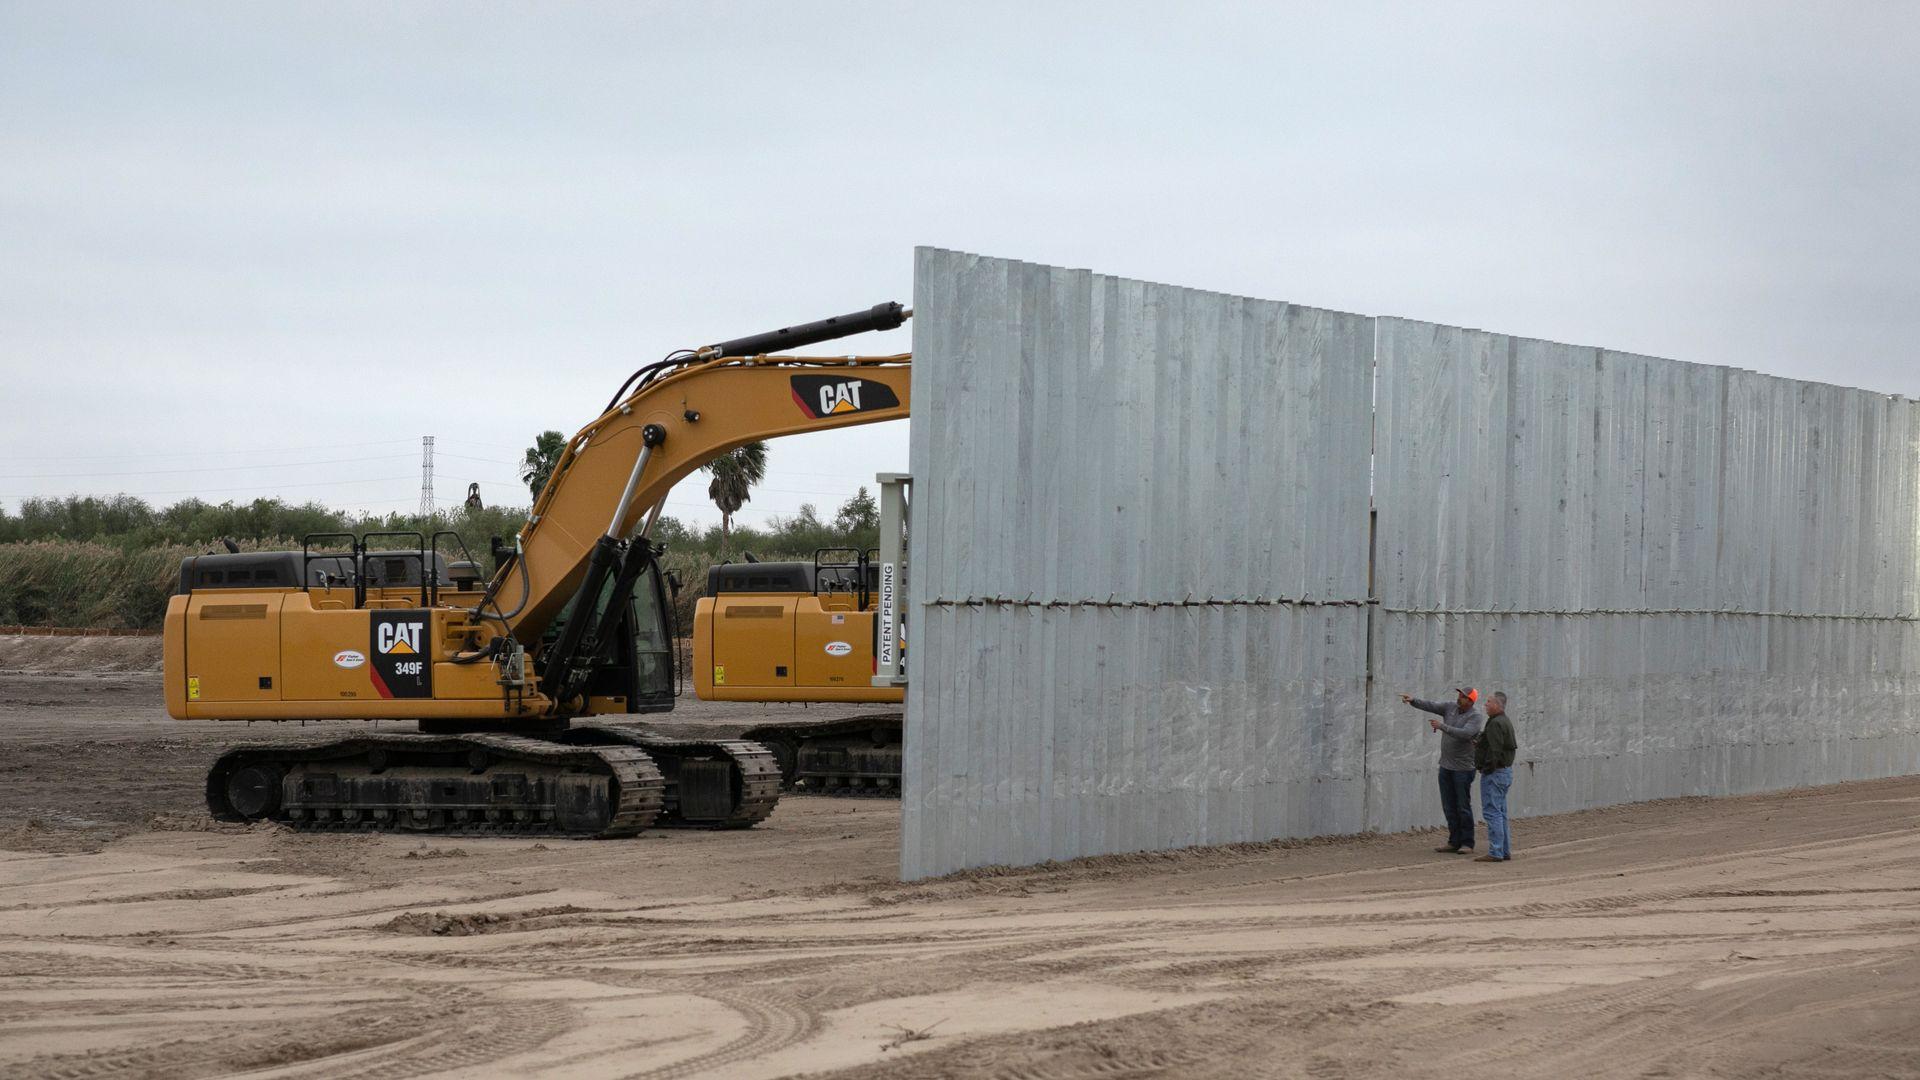 Border wall construction at the U.S.-Mexico border